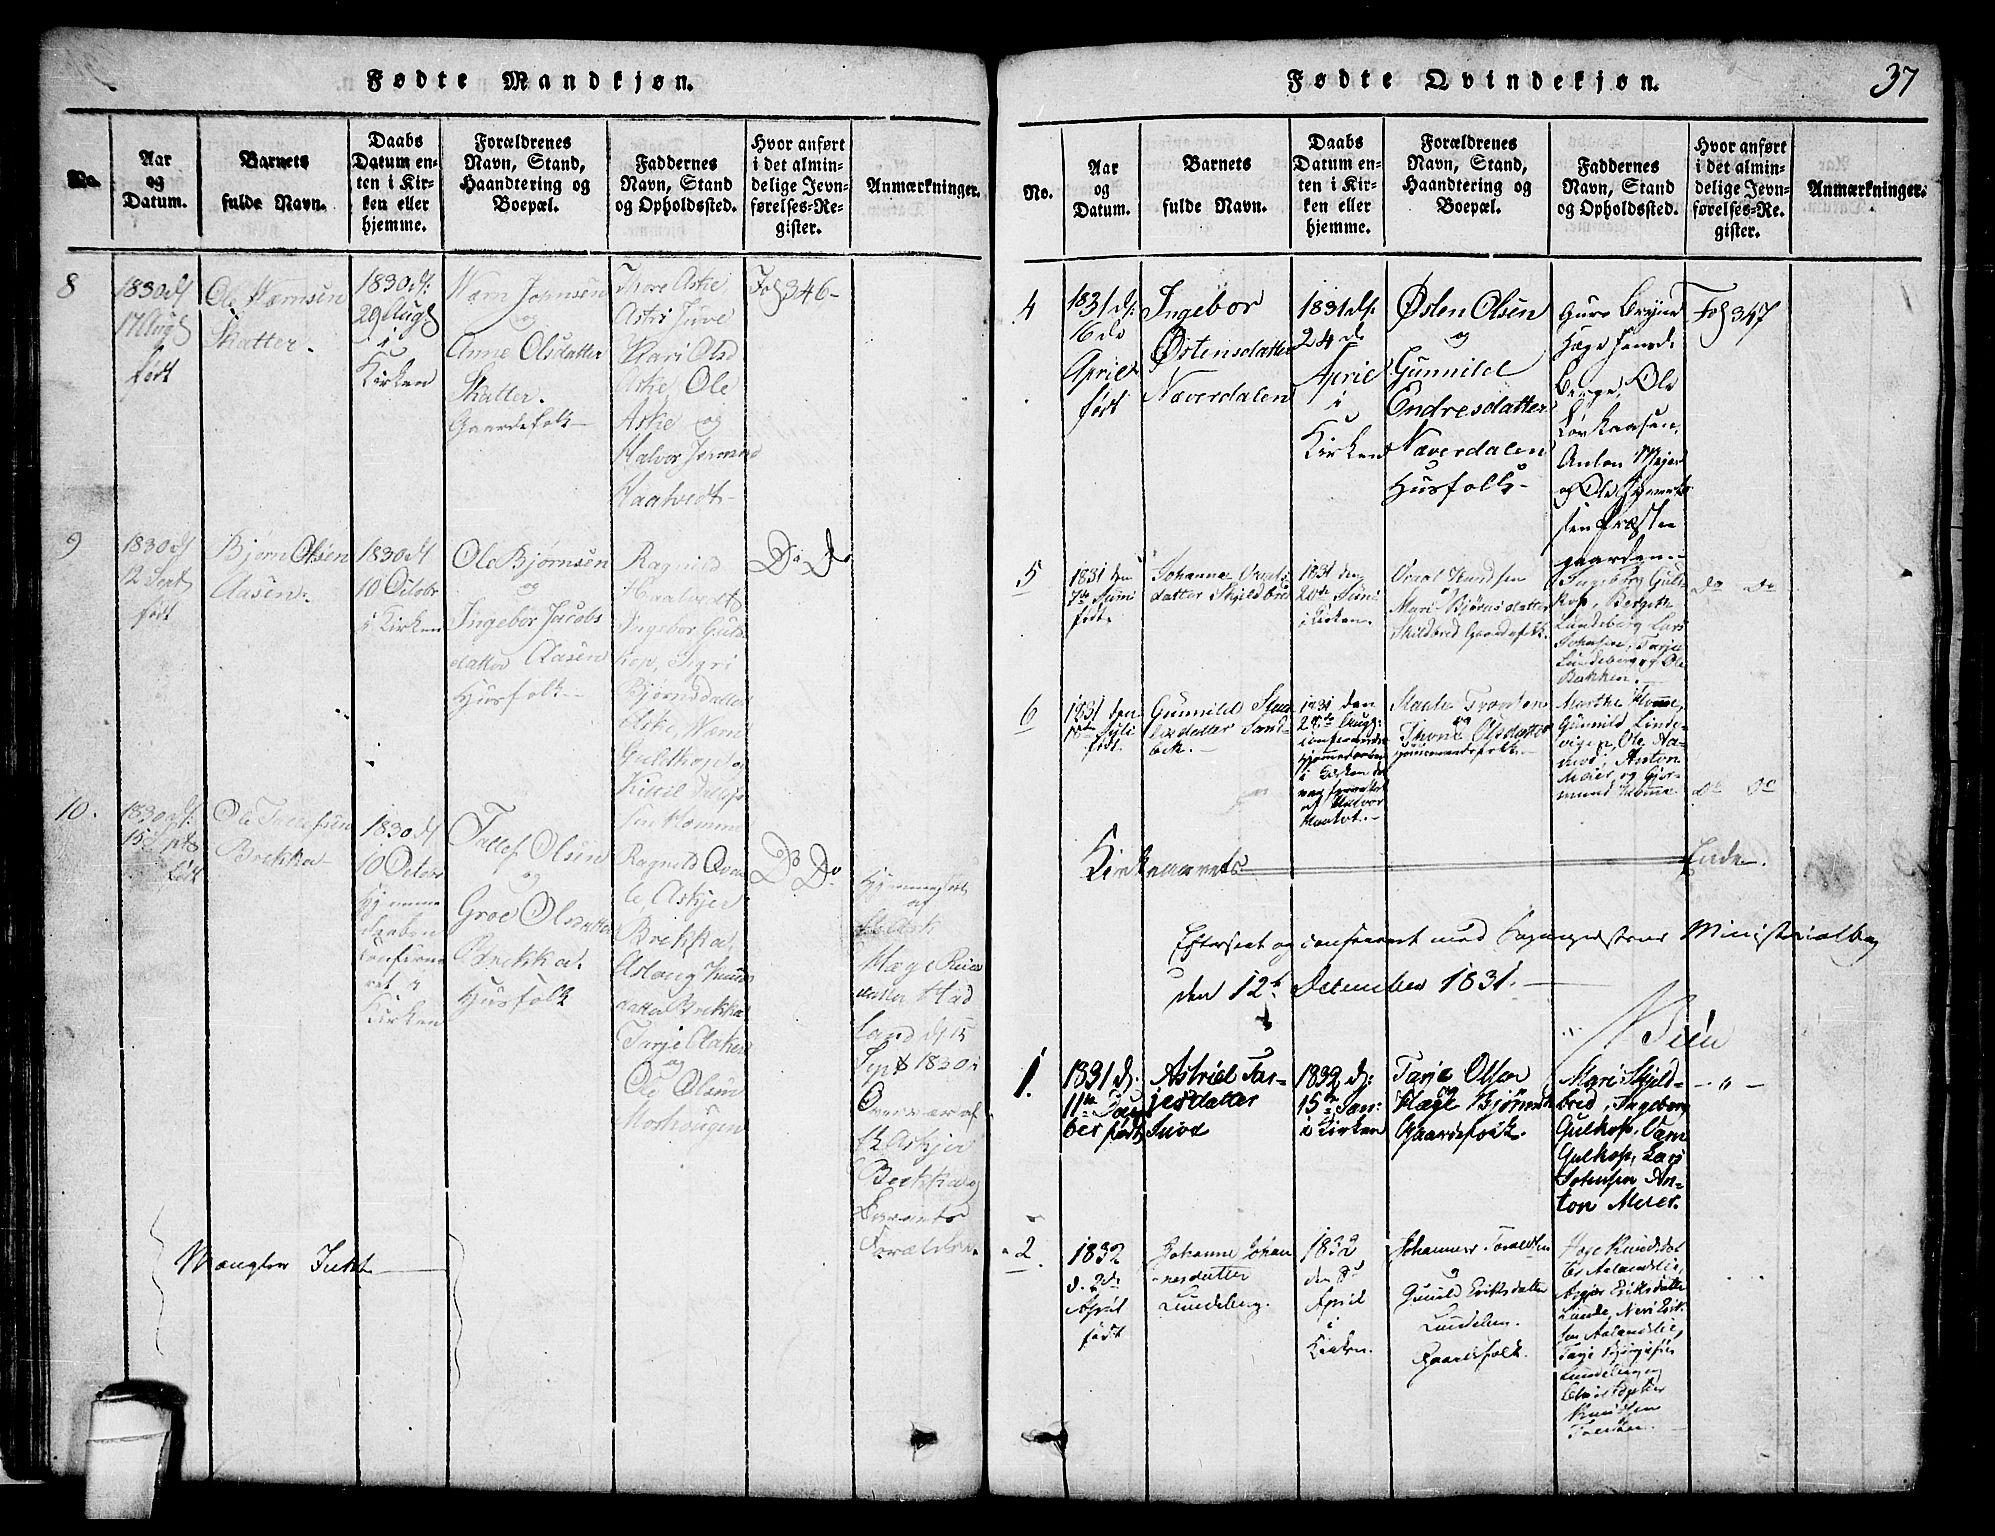 SAKO, Lårdal kirkebøker, G/Ga/L0001: Klokkerbok nr. I 1, 1815-1861, s. 37